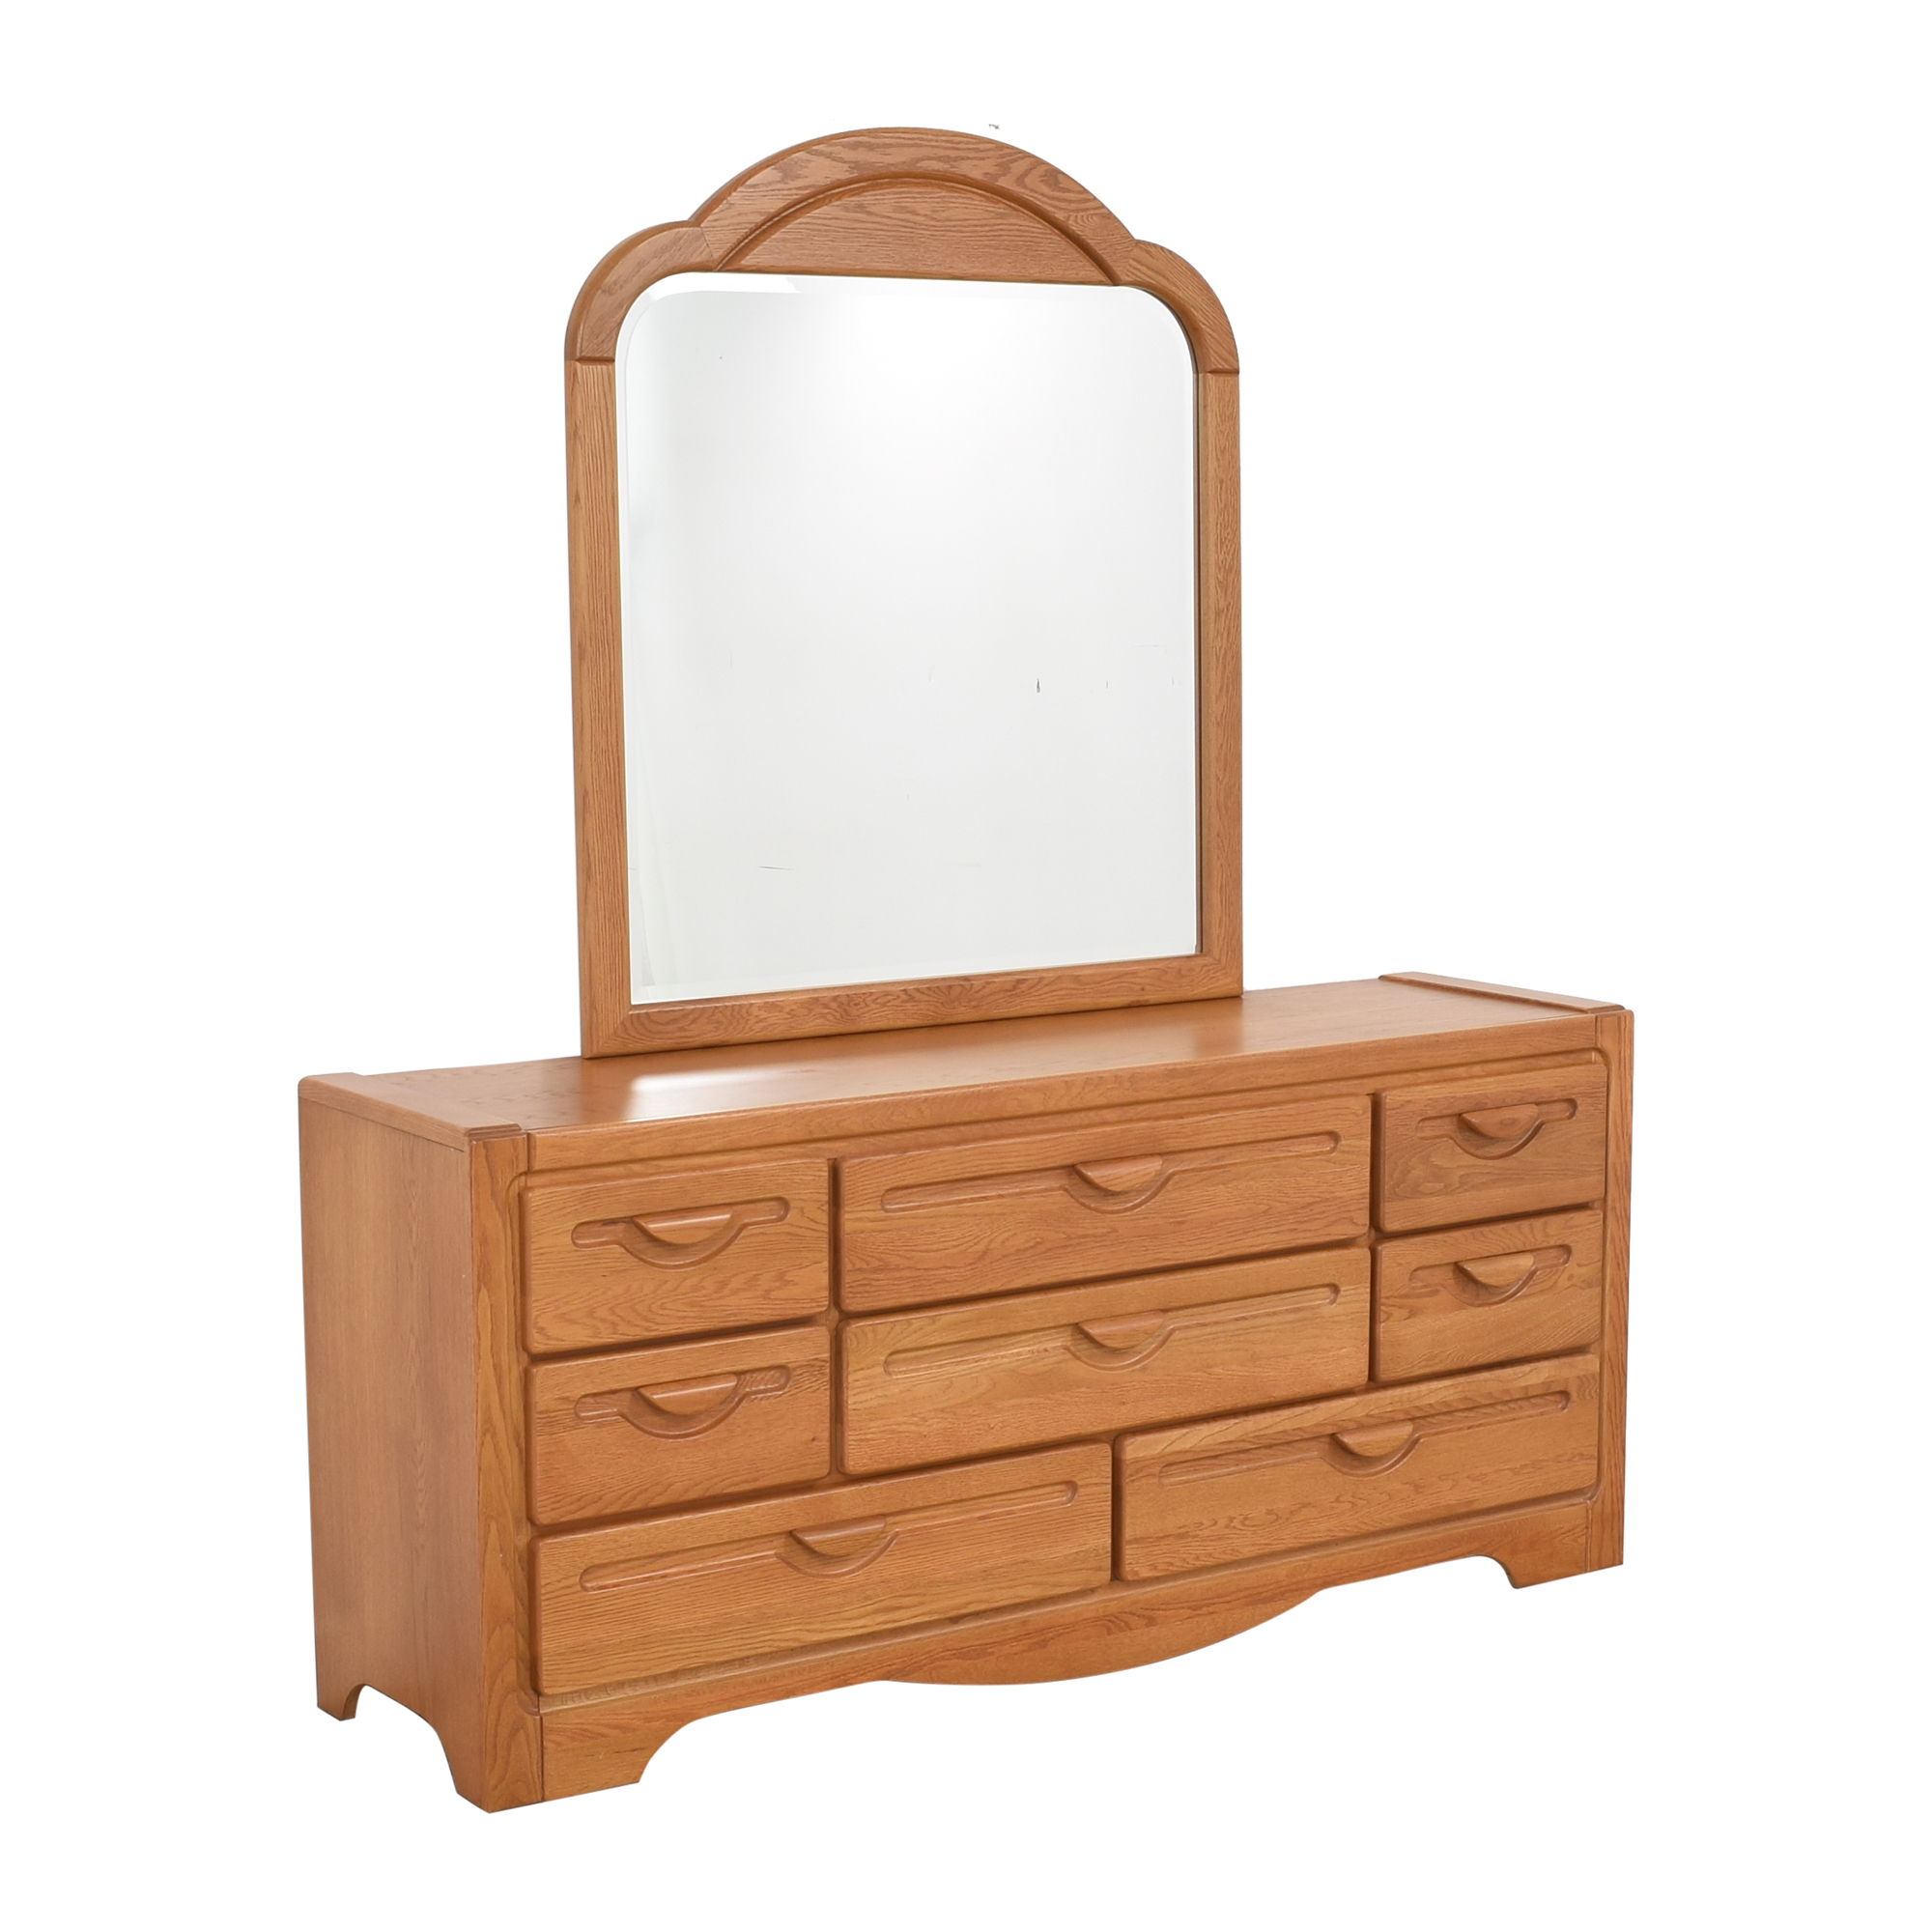 Webb Furniture Webb Furniture Dresser with Mirror